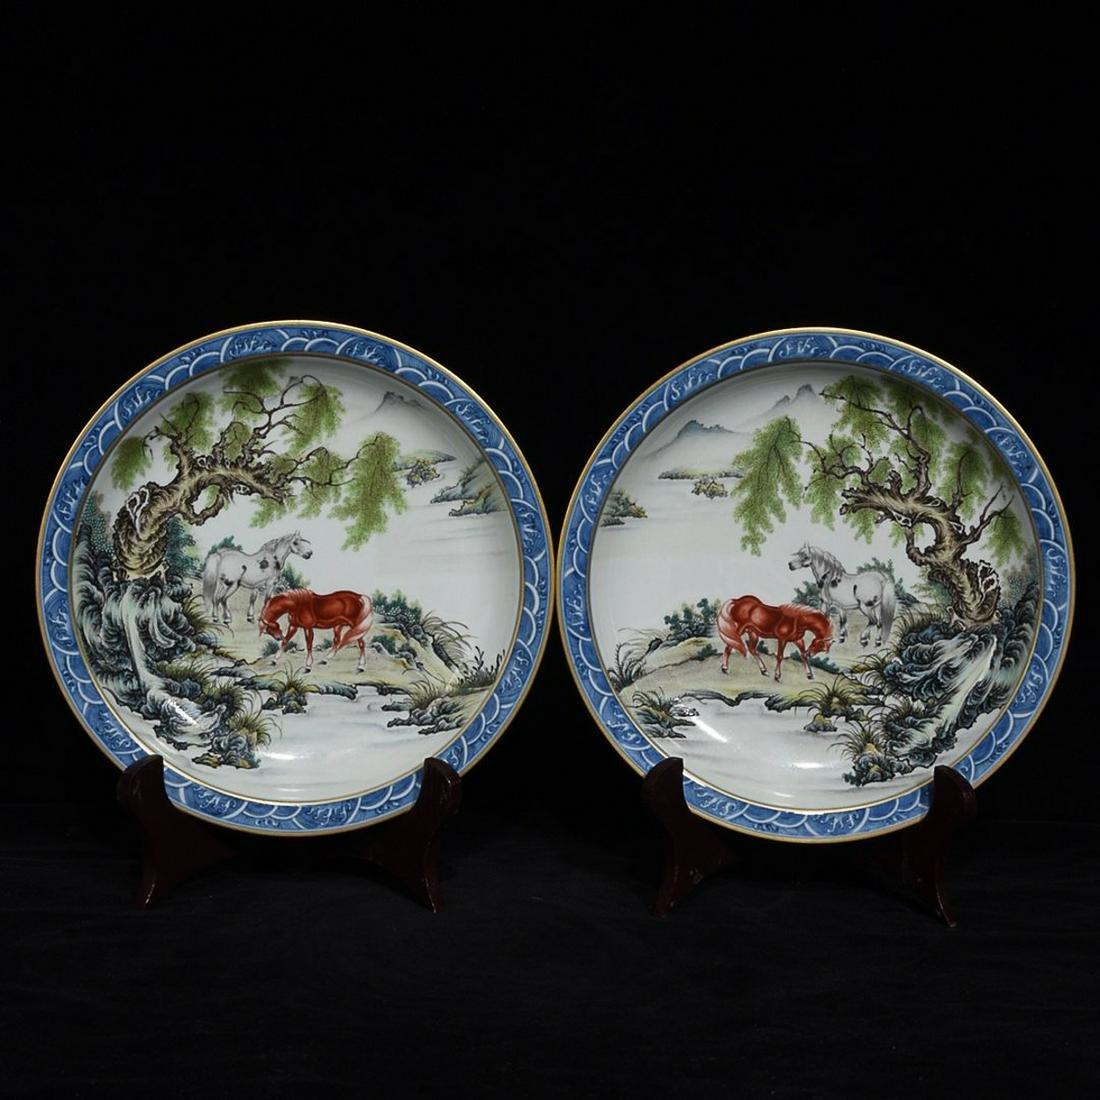 YONGZHENG MARK BLUE WHITE EDGED FAMILLE ROSE PLATE IN